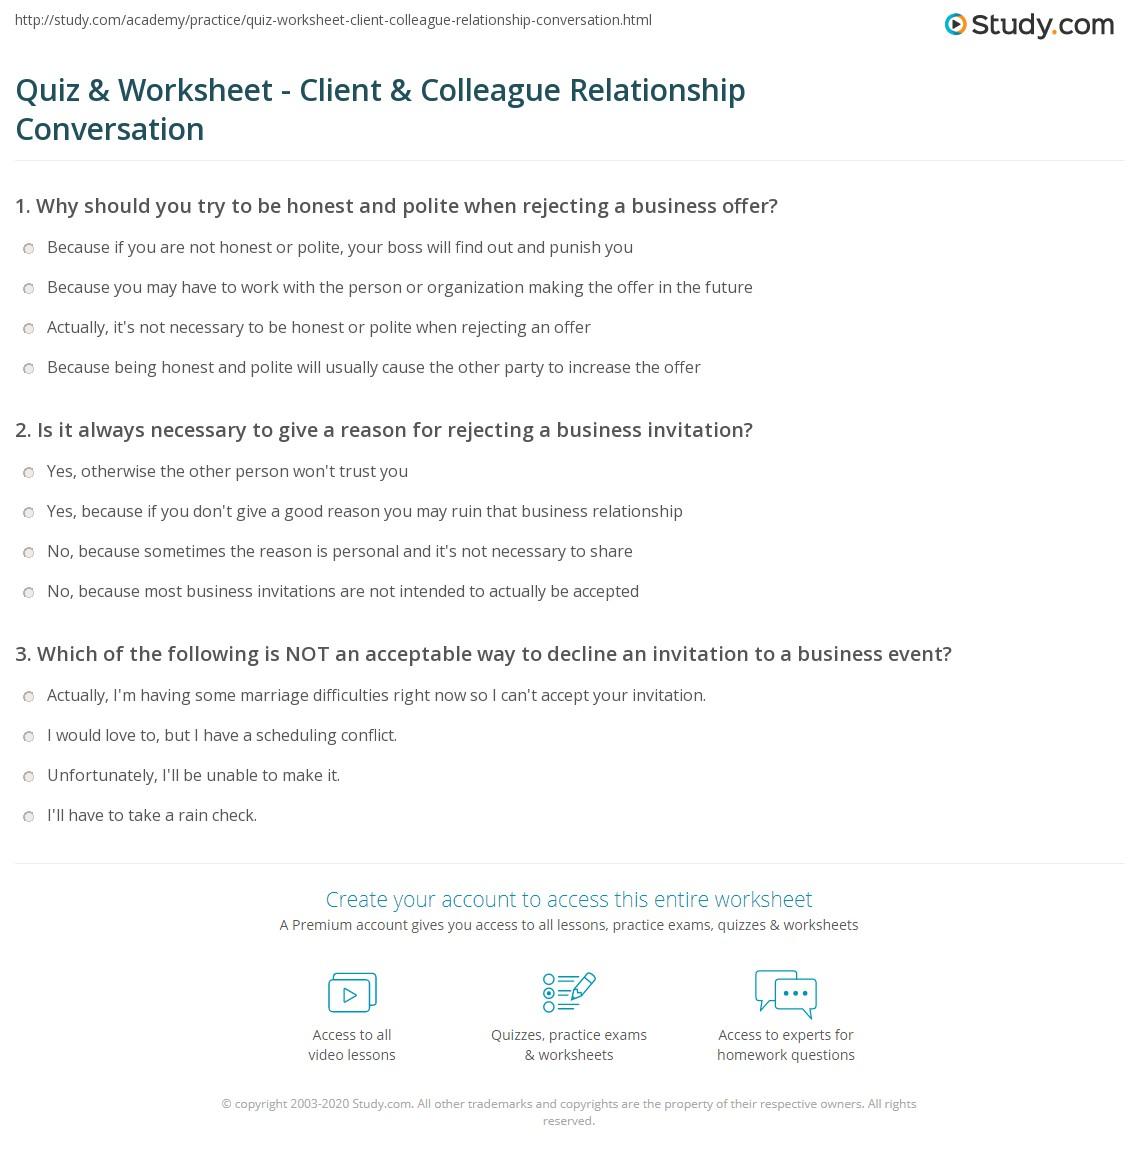 Quiz Worksheet Client Colleague Relationship Conversation